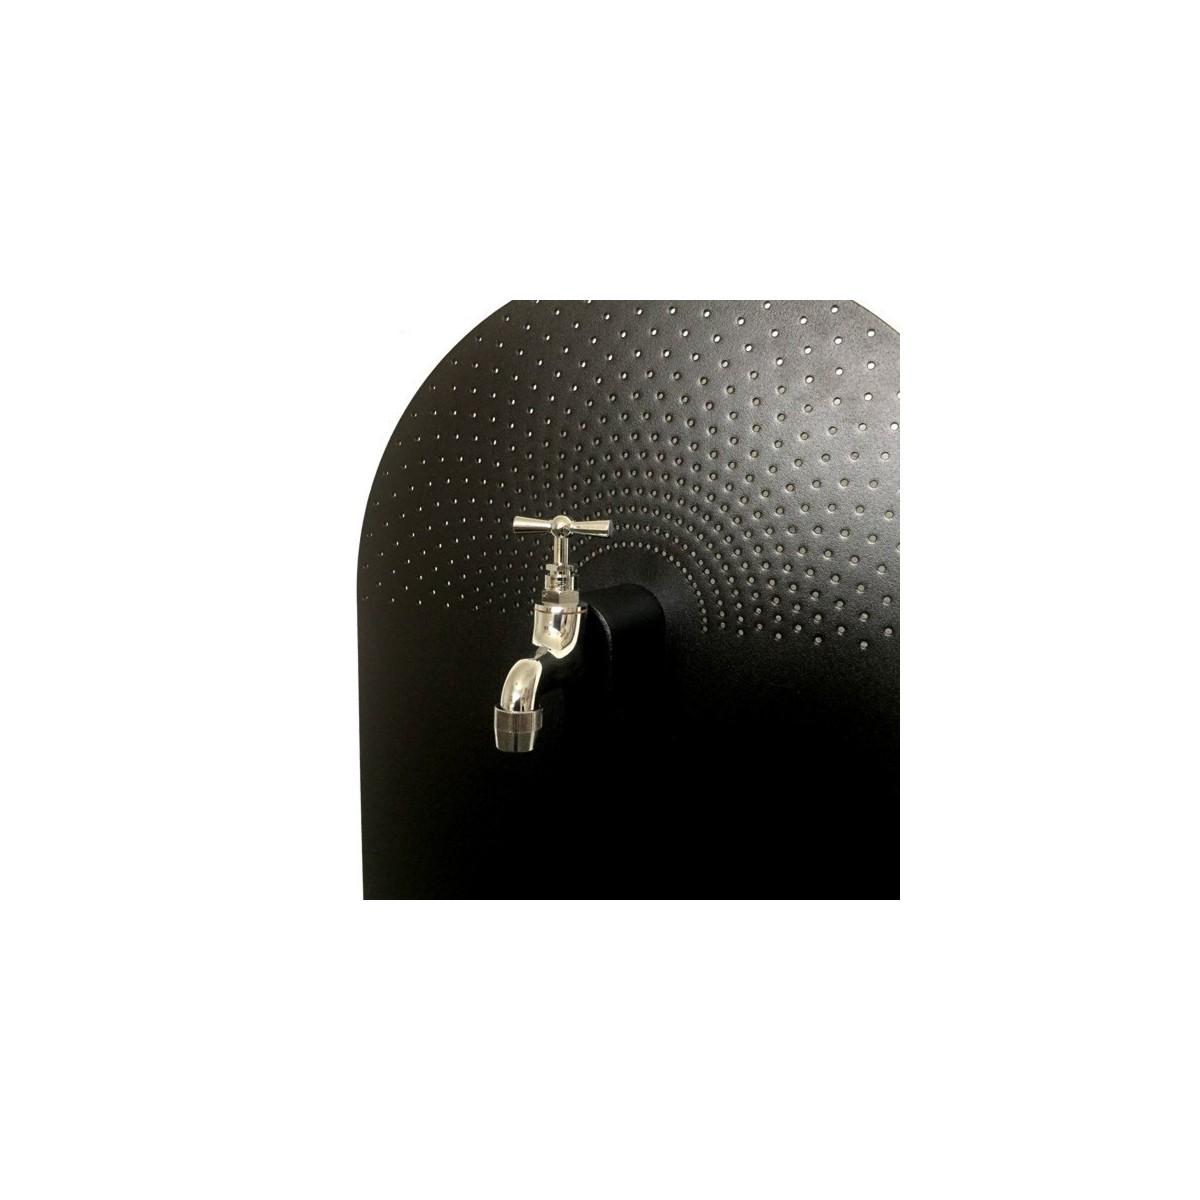 robinet laorus achat vente fontaine de jardin laorus. Black Bedroom Furniture Sets. Home Design Ideas